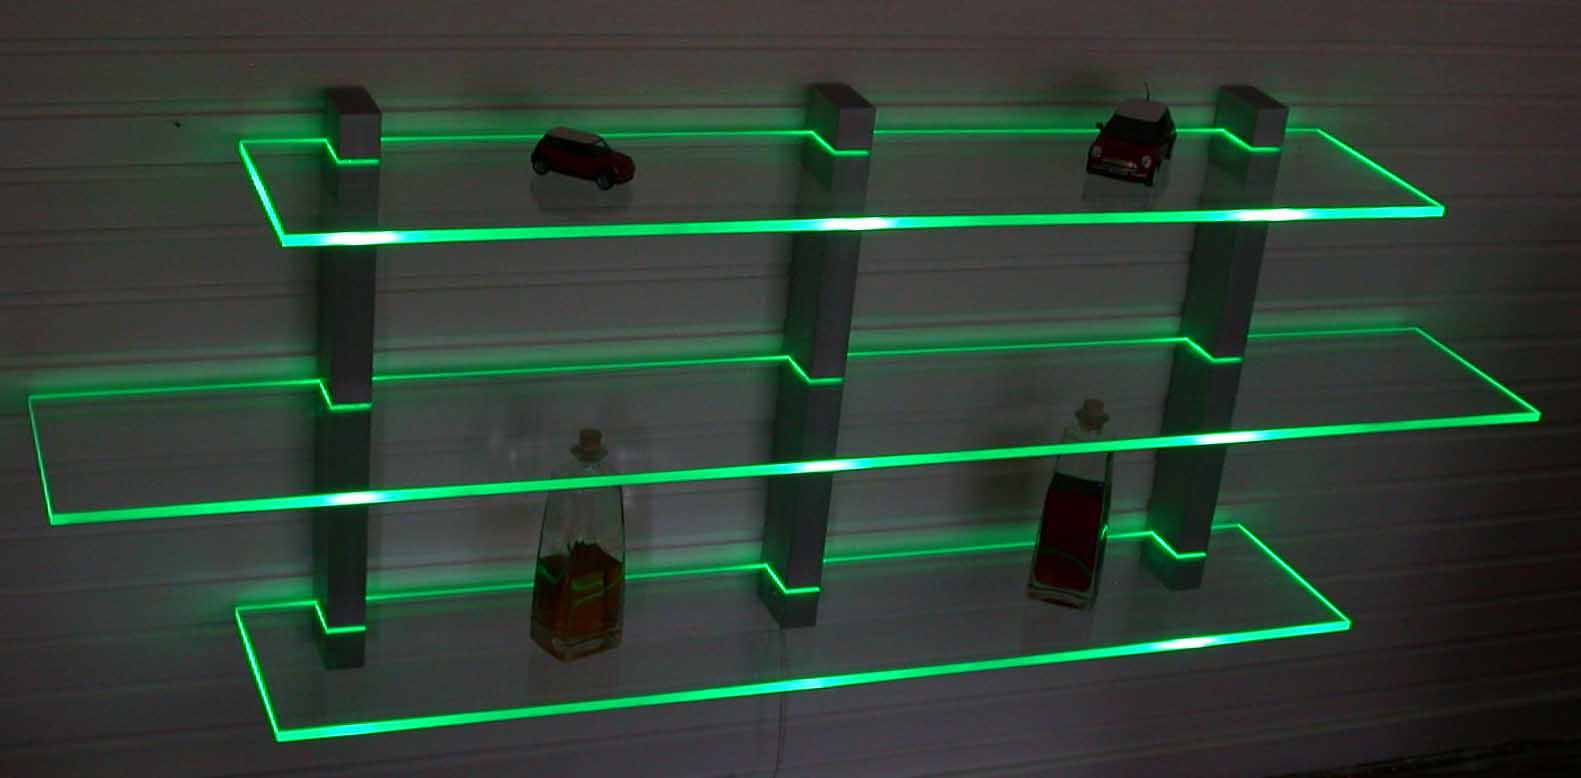 Led Regale Led Regale Cd Dvd Rgb Design Beleuchtung